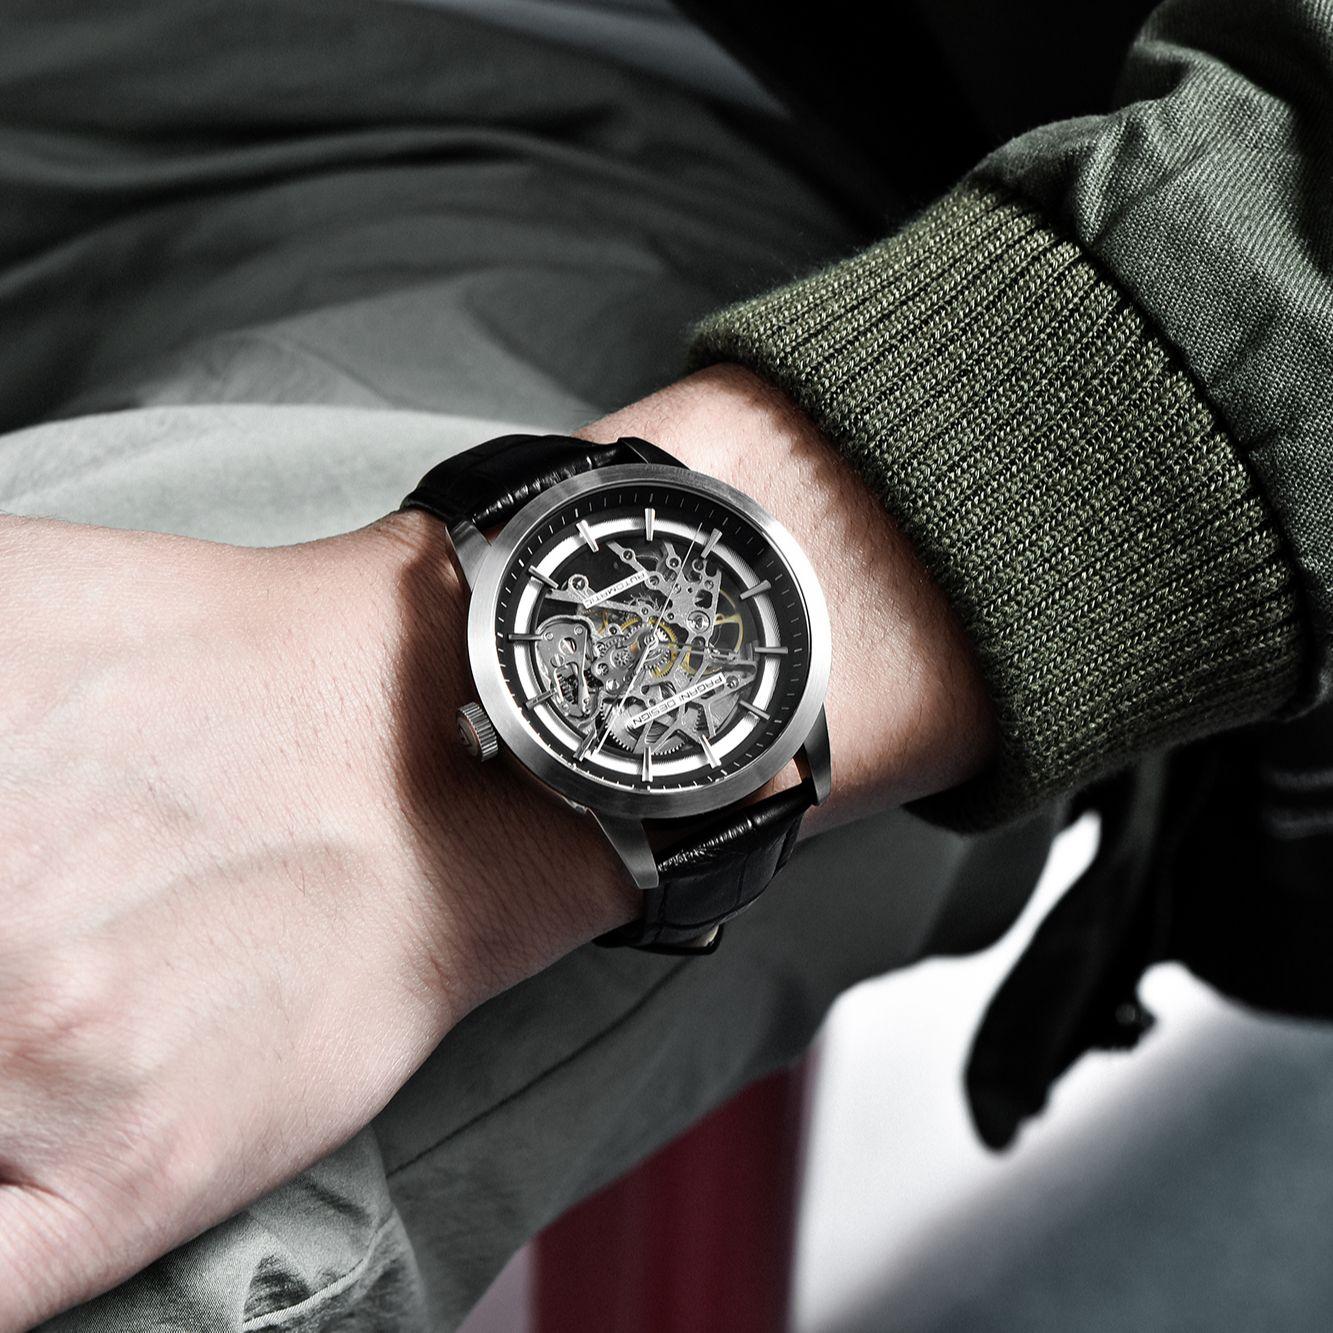 2021 Pagani Design Top Brand Watch Men's Automatic Mechanical Watch Fashion Sports Leather Waterproof Watch Luxury Reloj Hombre enlarge